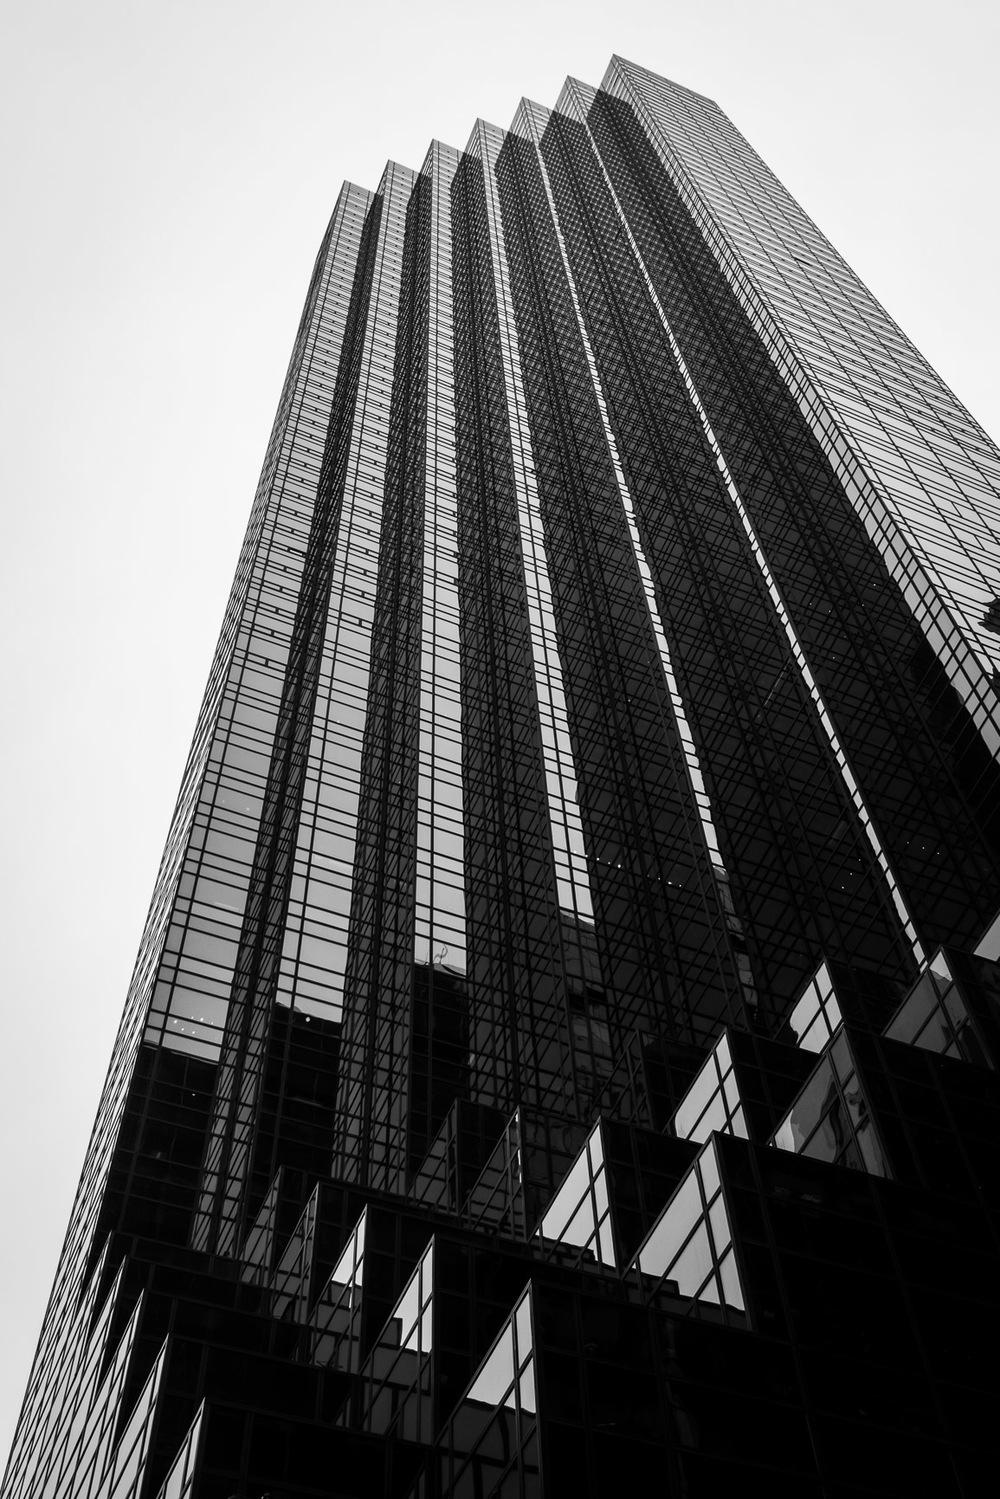 2015-05-14-NYC-0178.jpg